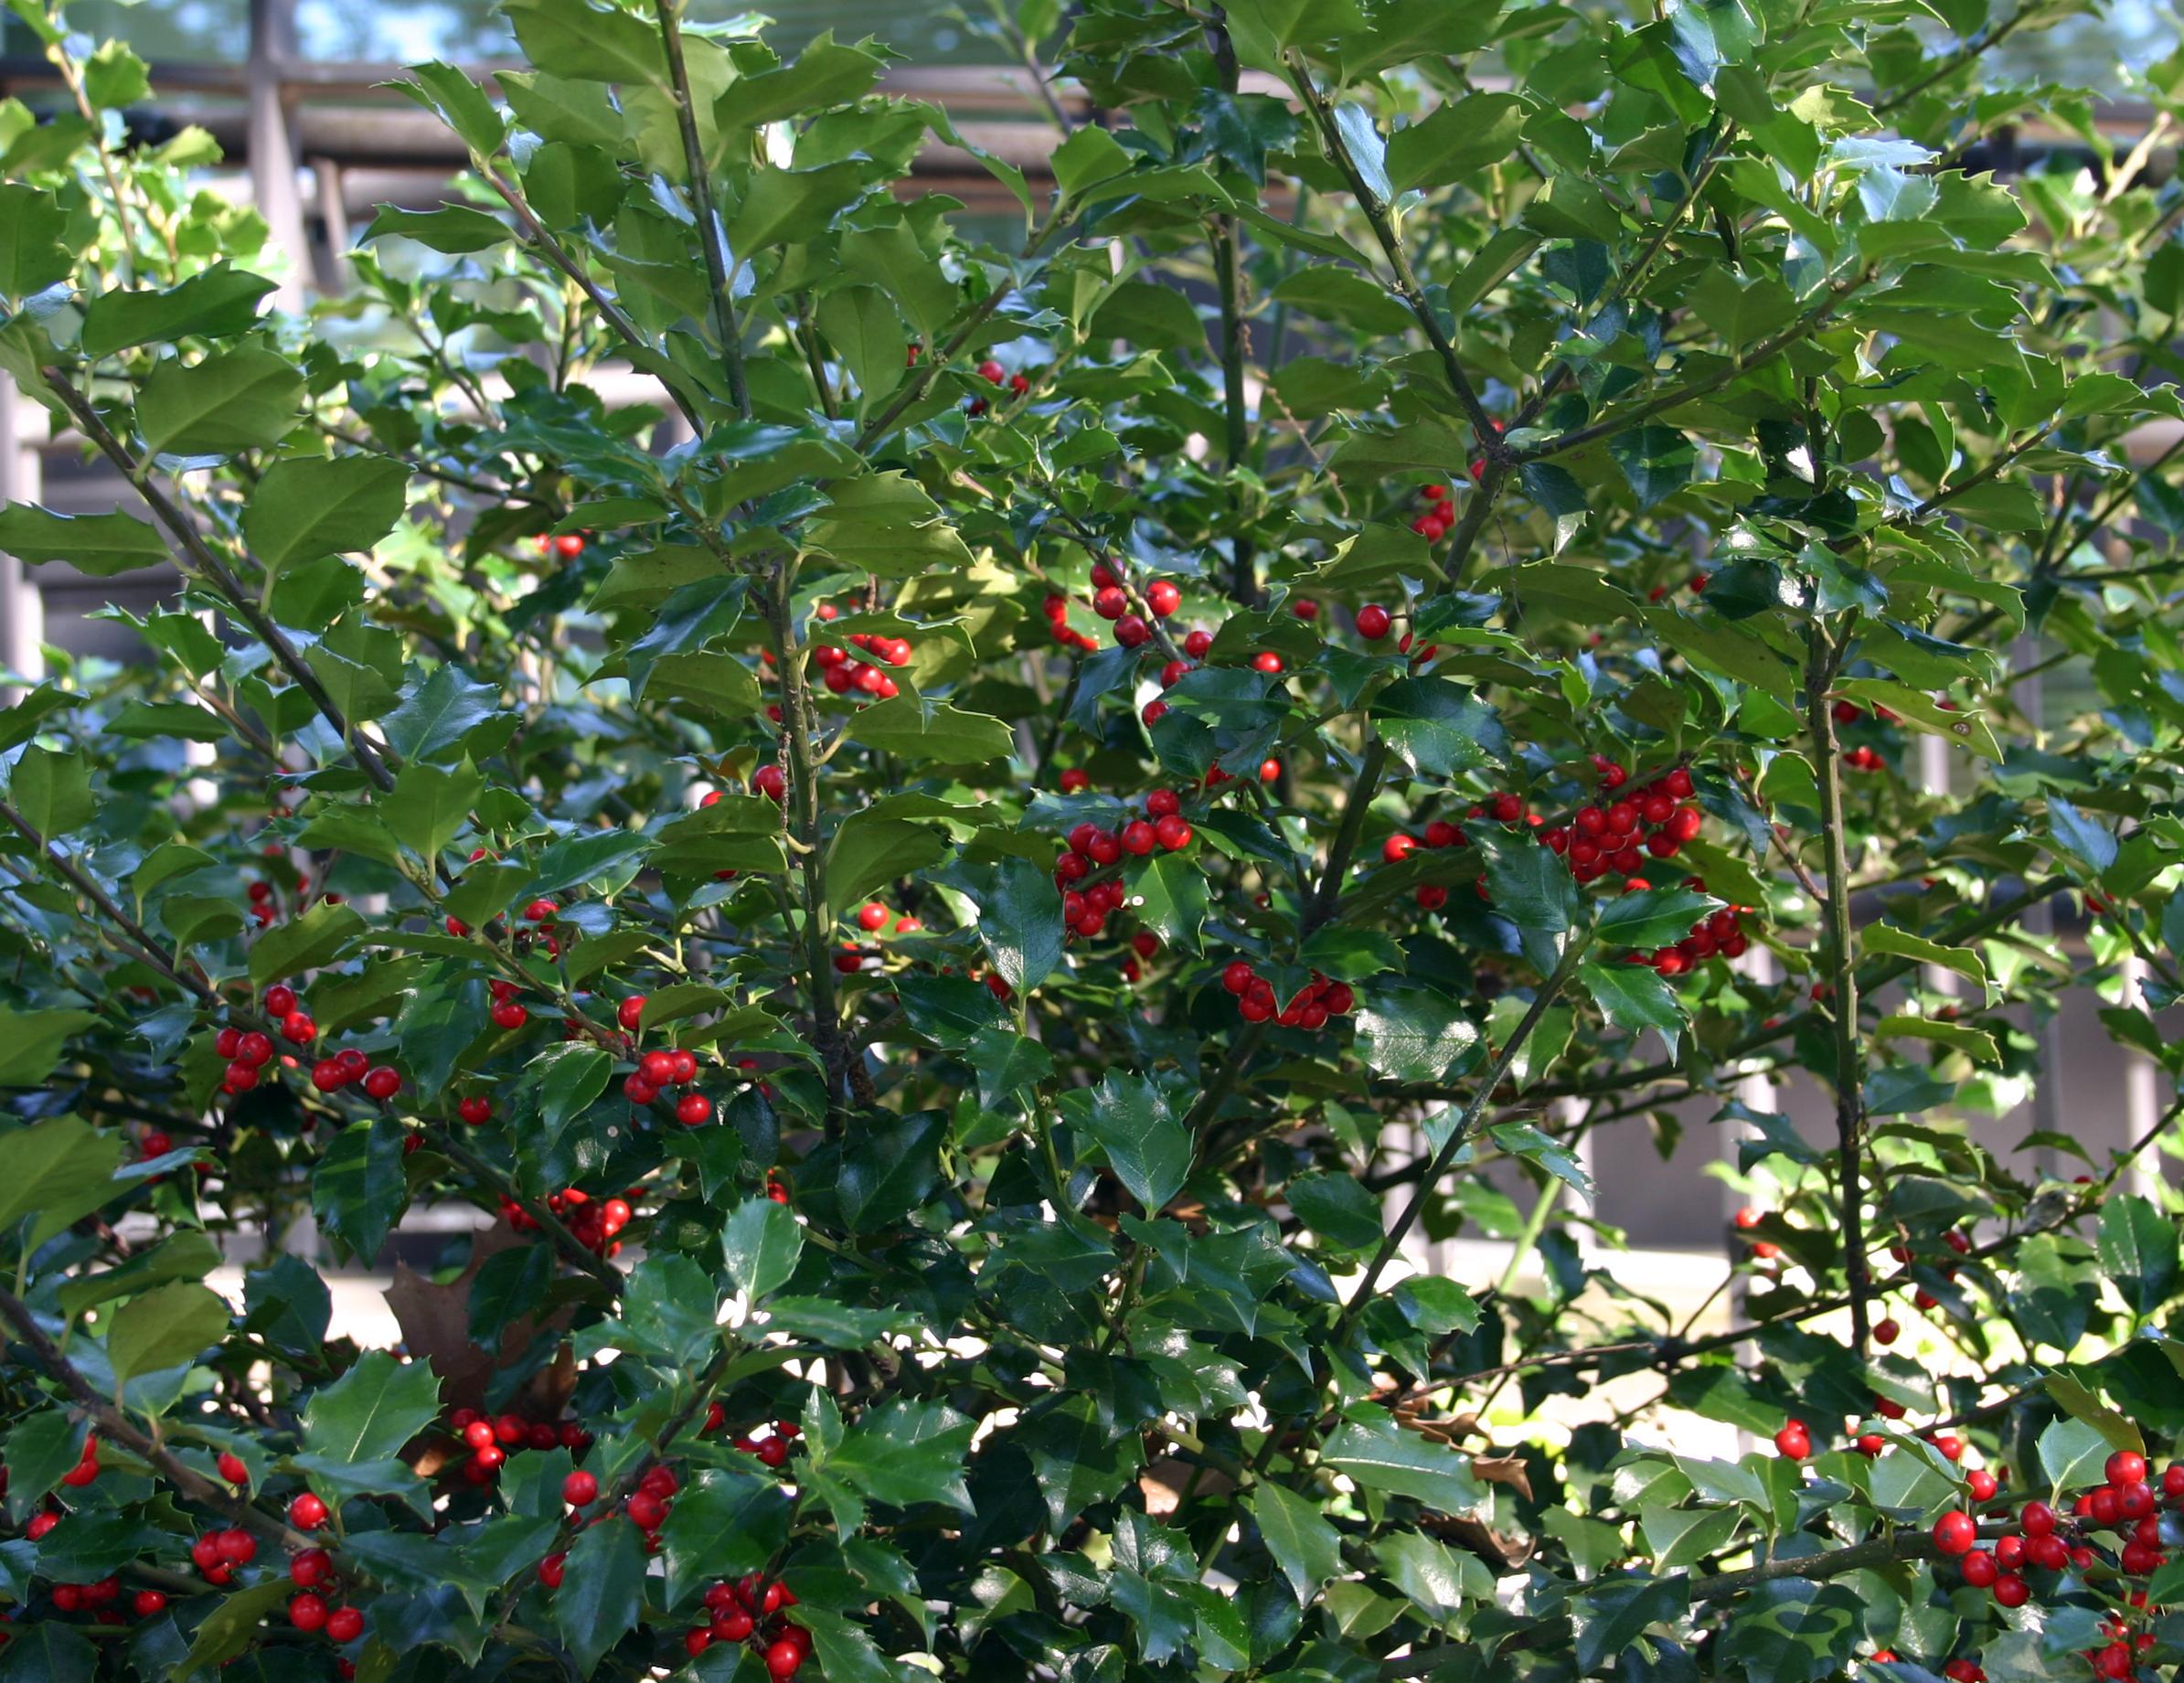 Medicinal Plants American Holly